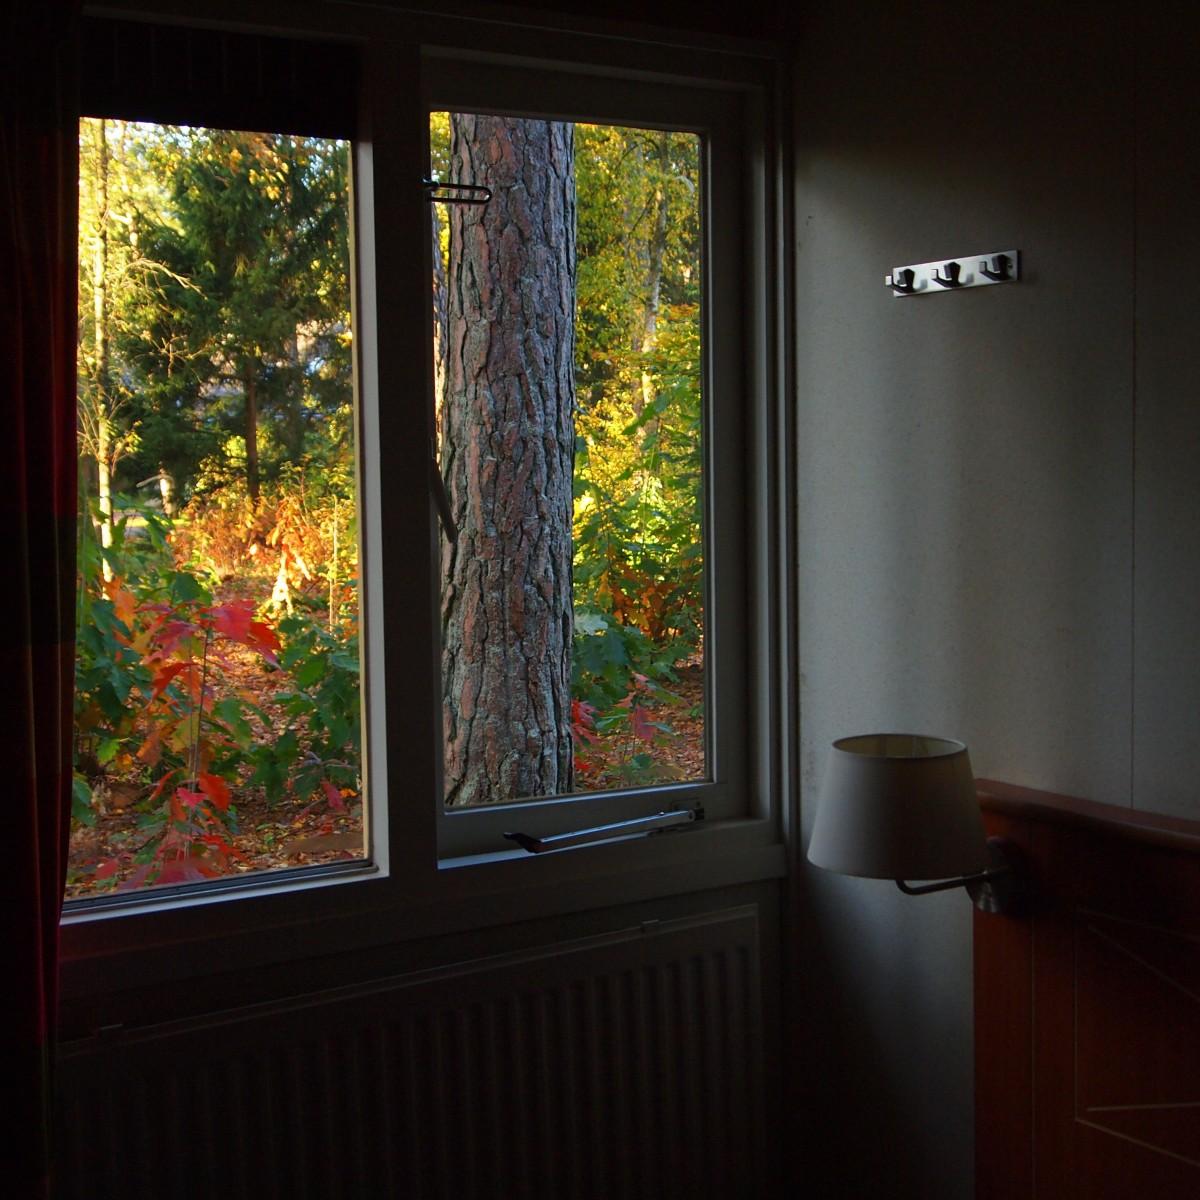 room_window_vista_autumn_garden_colors_f